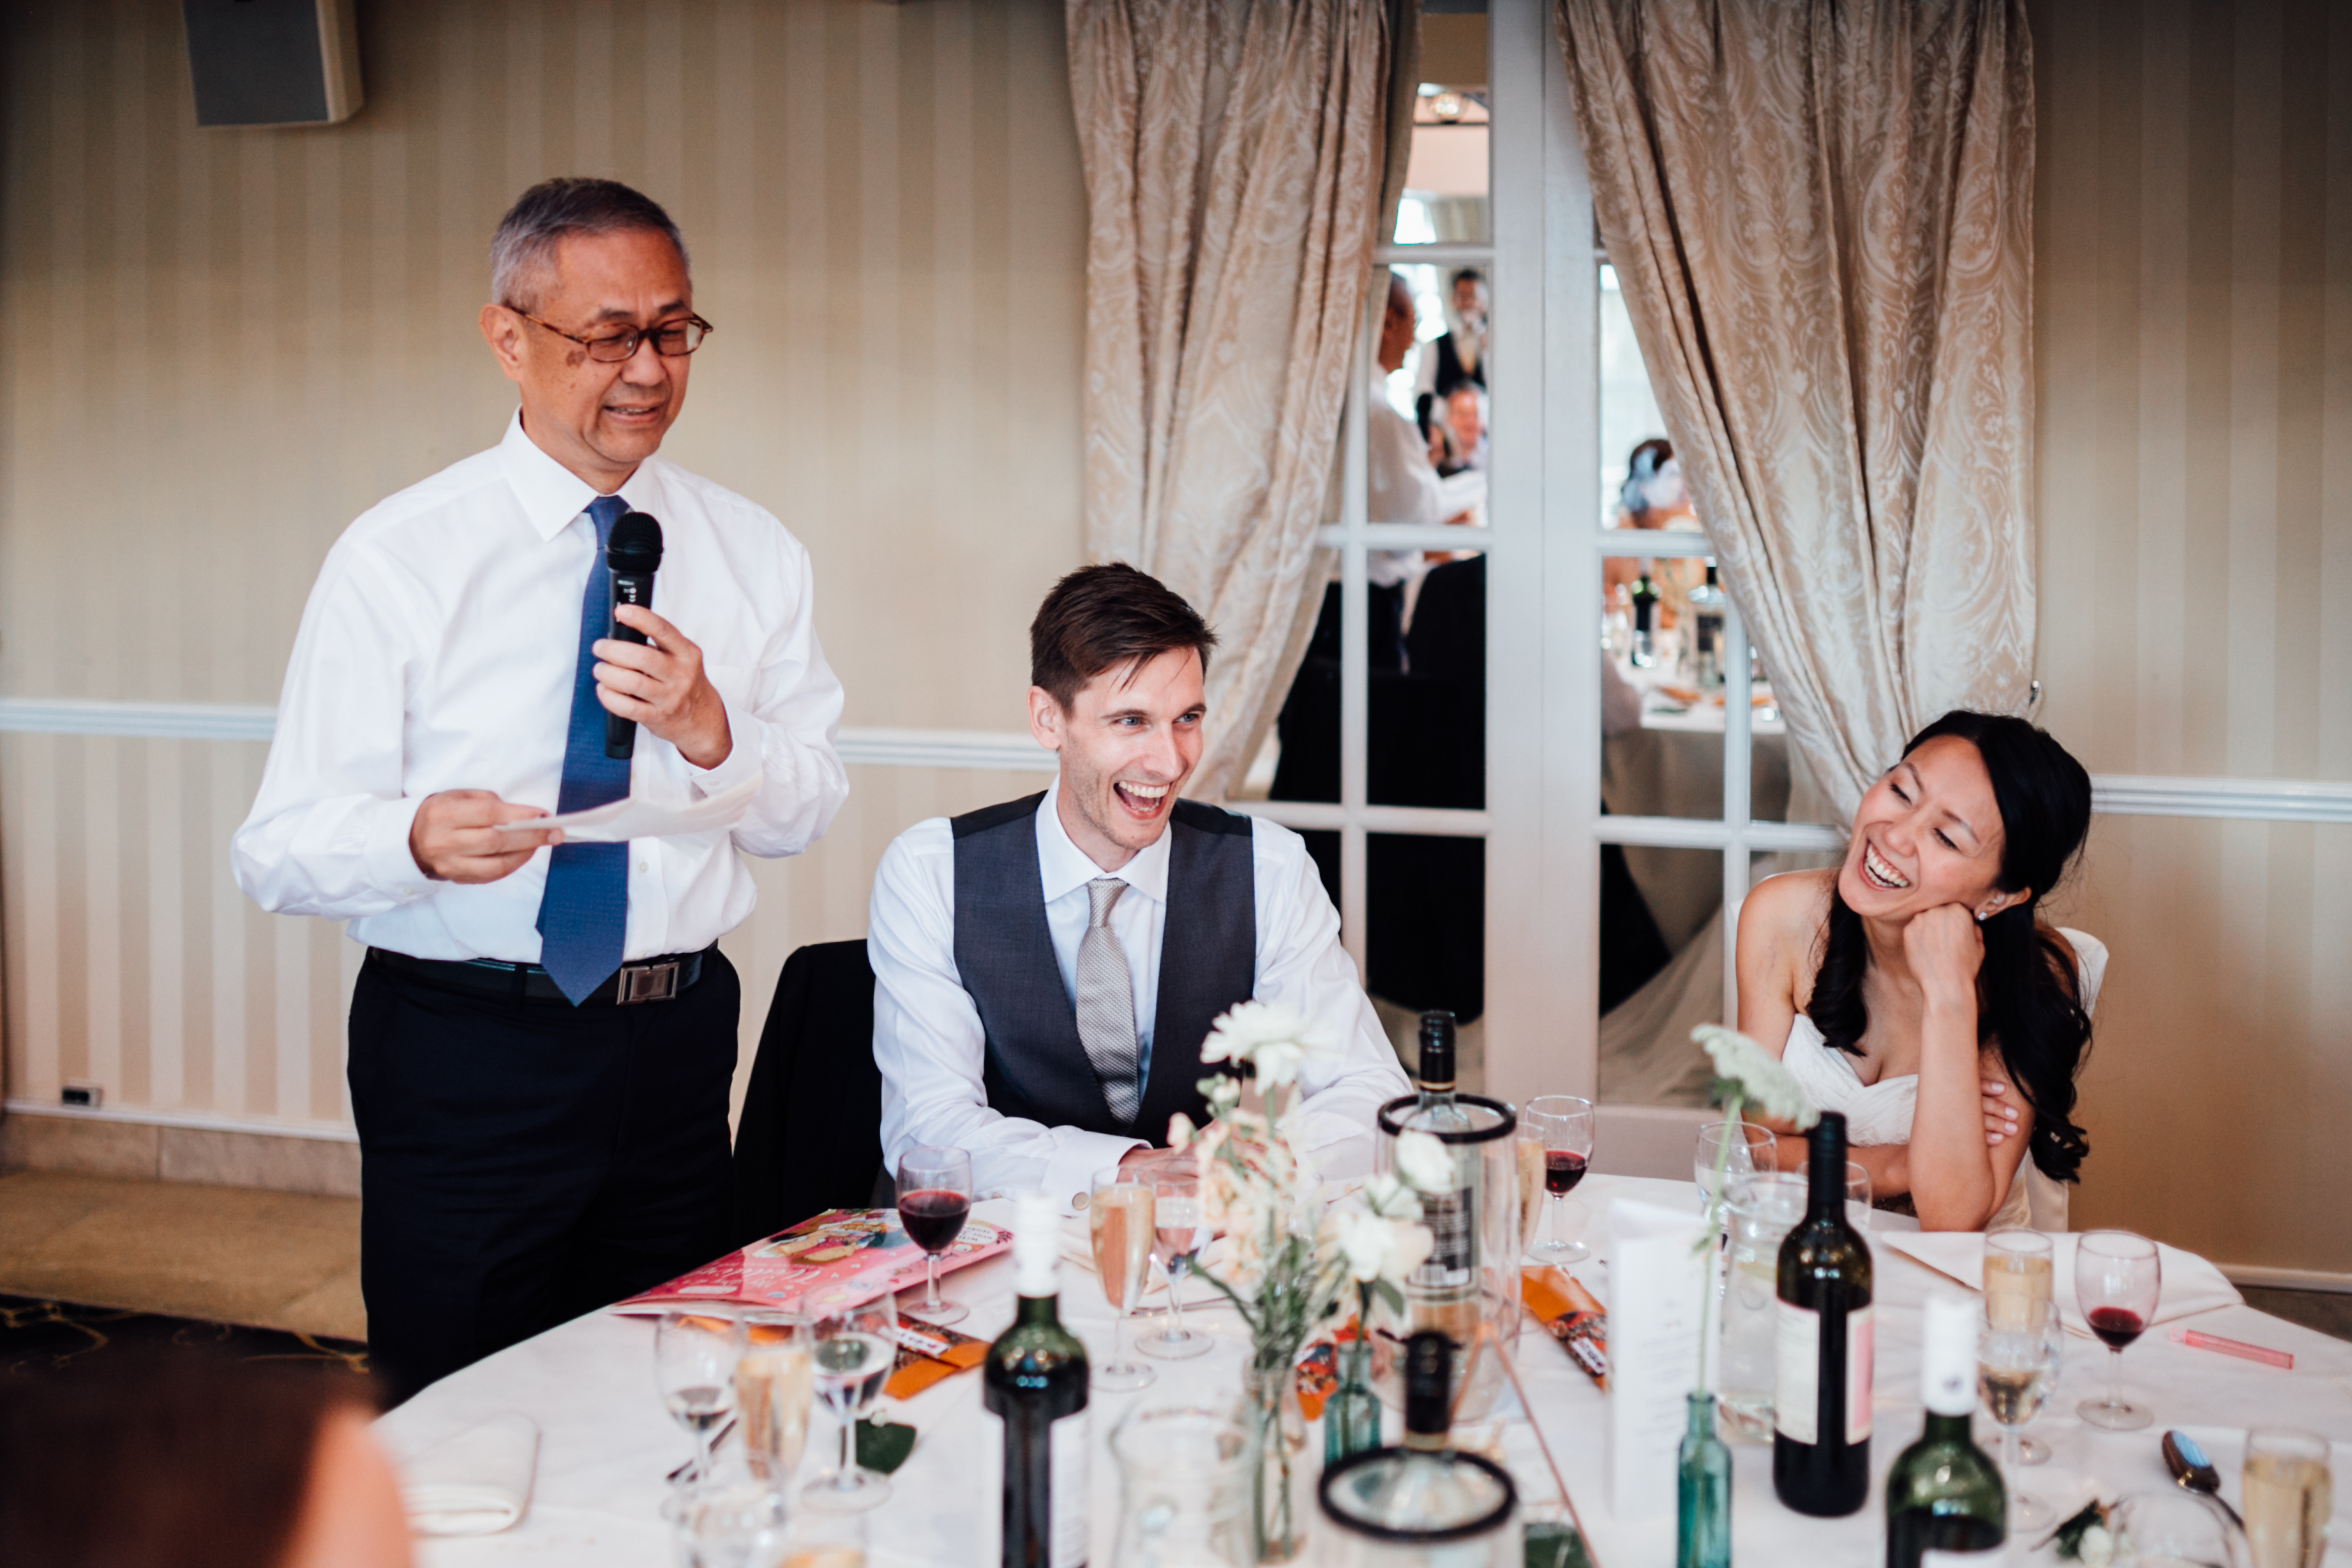 documentary wedding photography london and brighton speeches